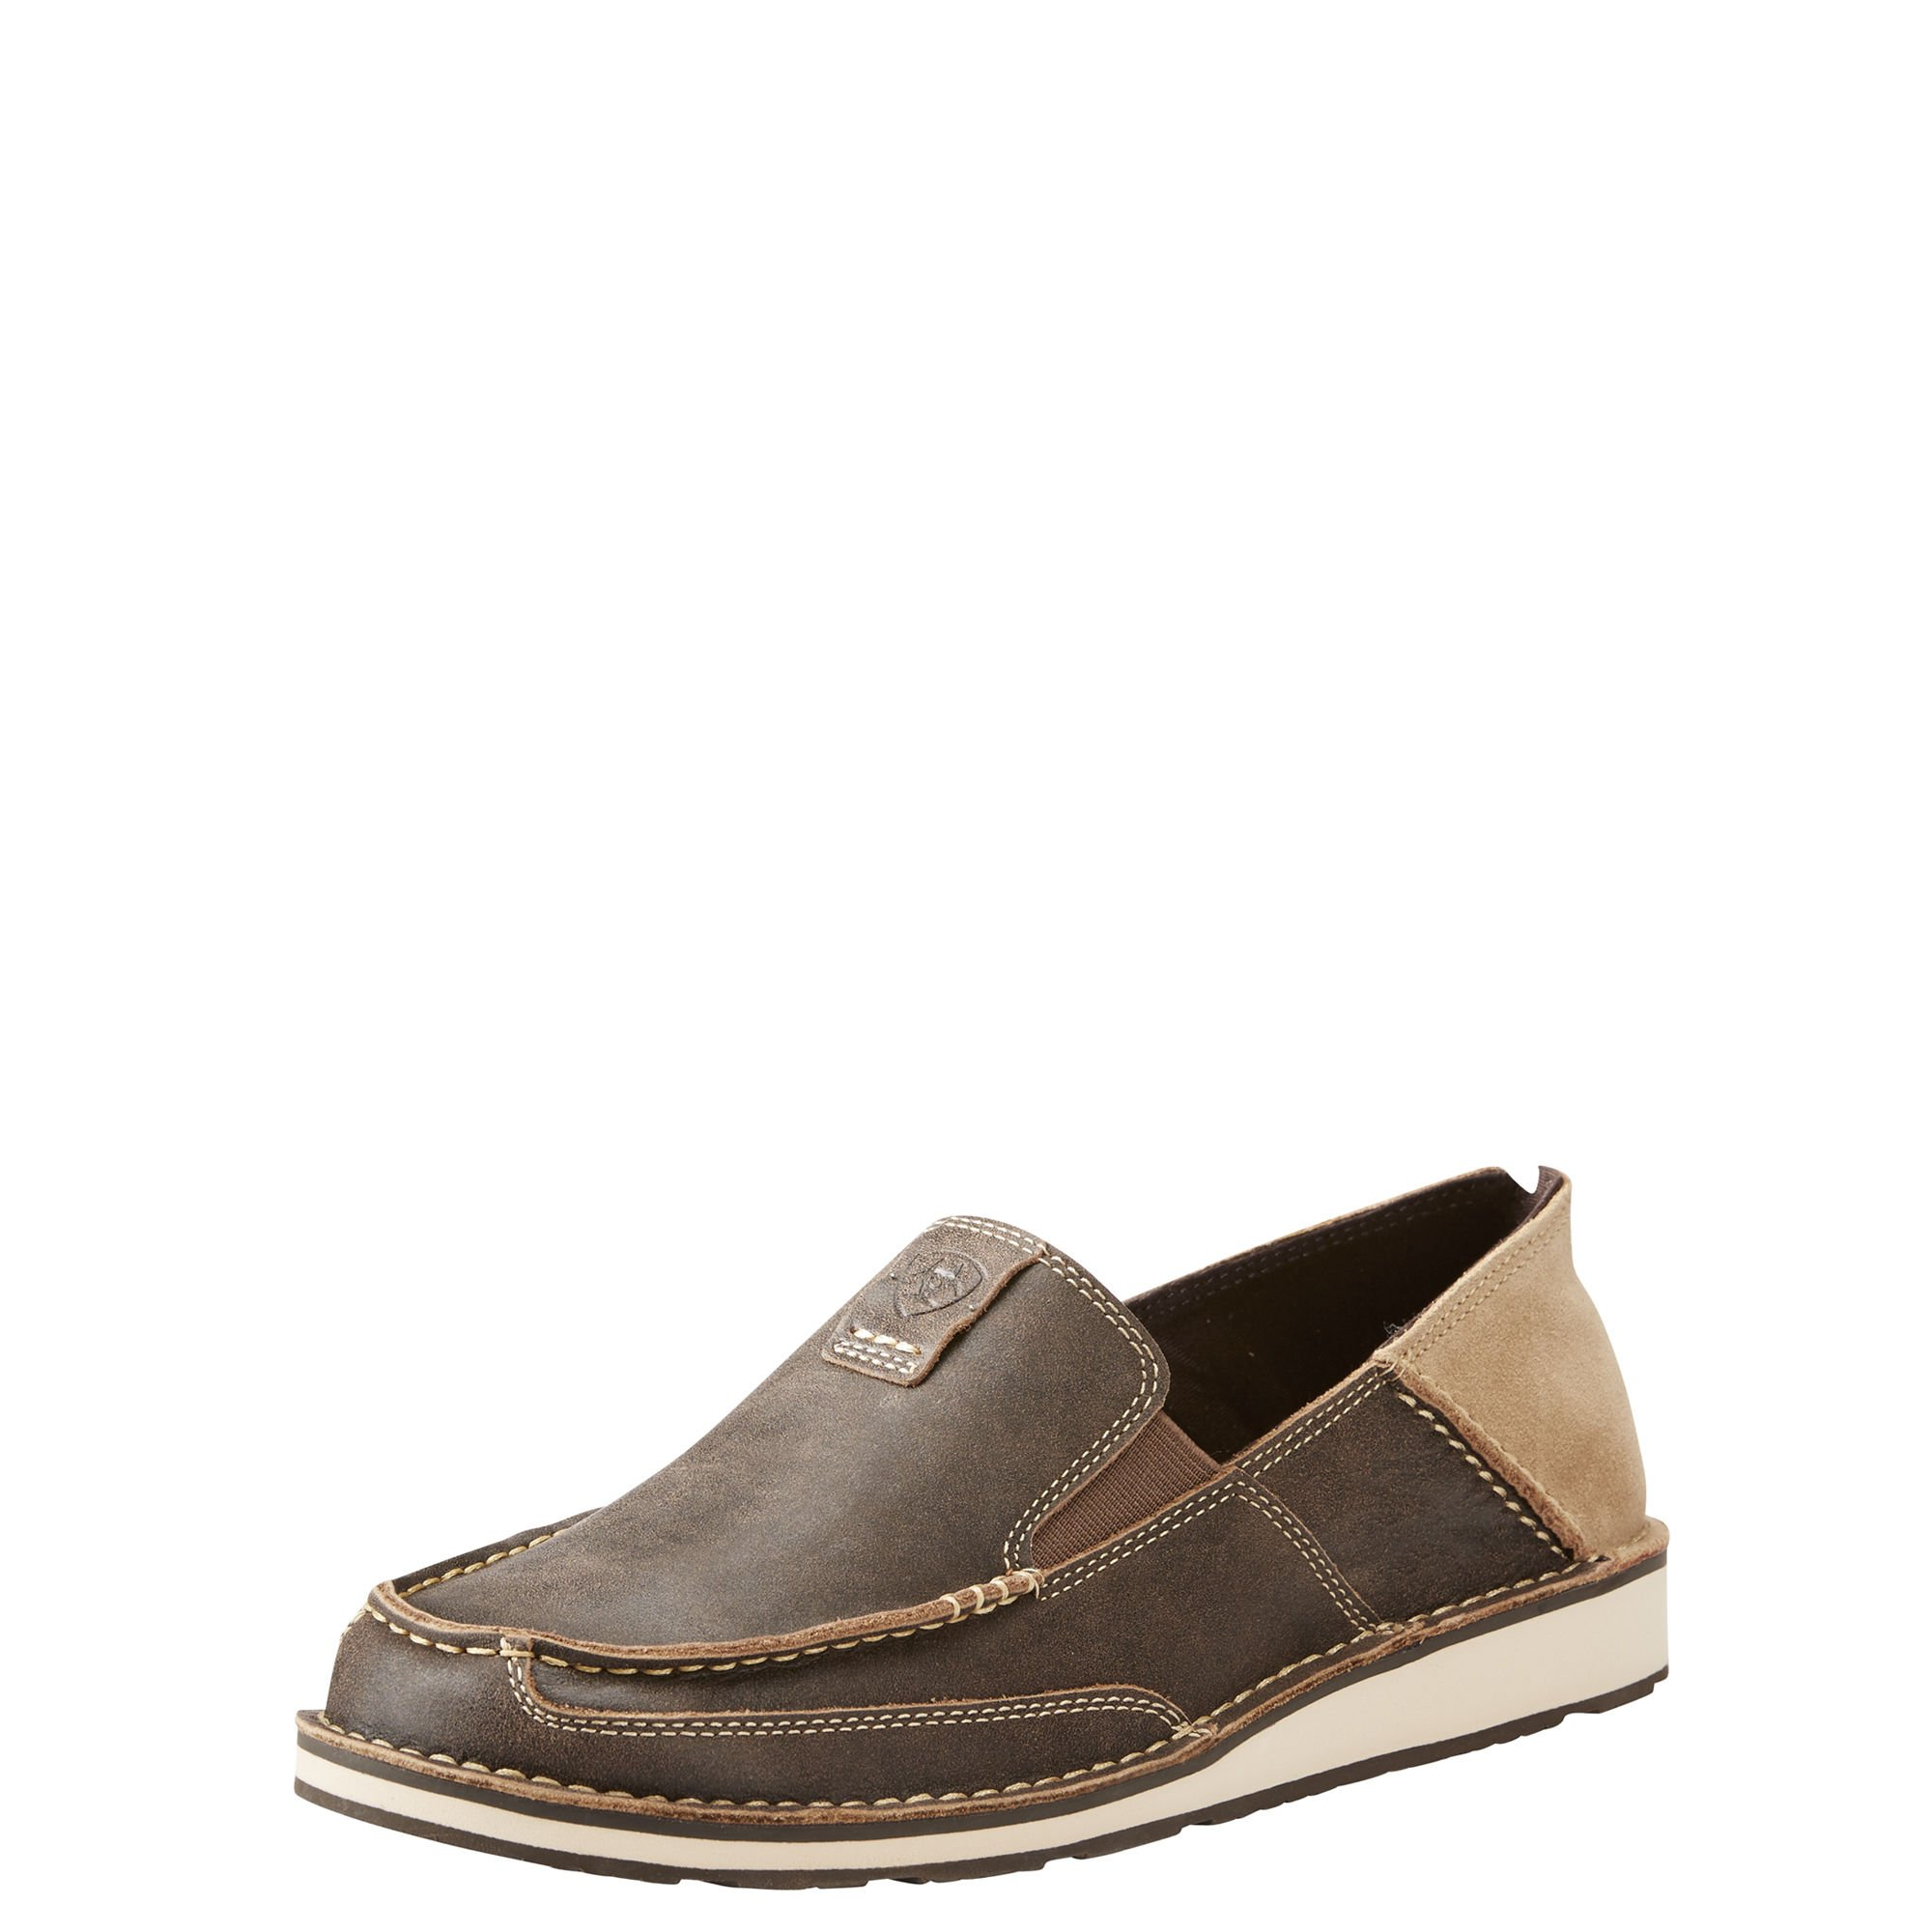 Ariat Men's Cruiser Slip-on Shoe, Vintage Bomber, 8.5 EE US